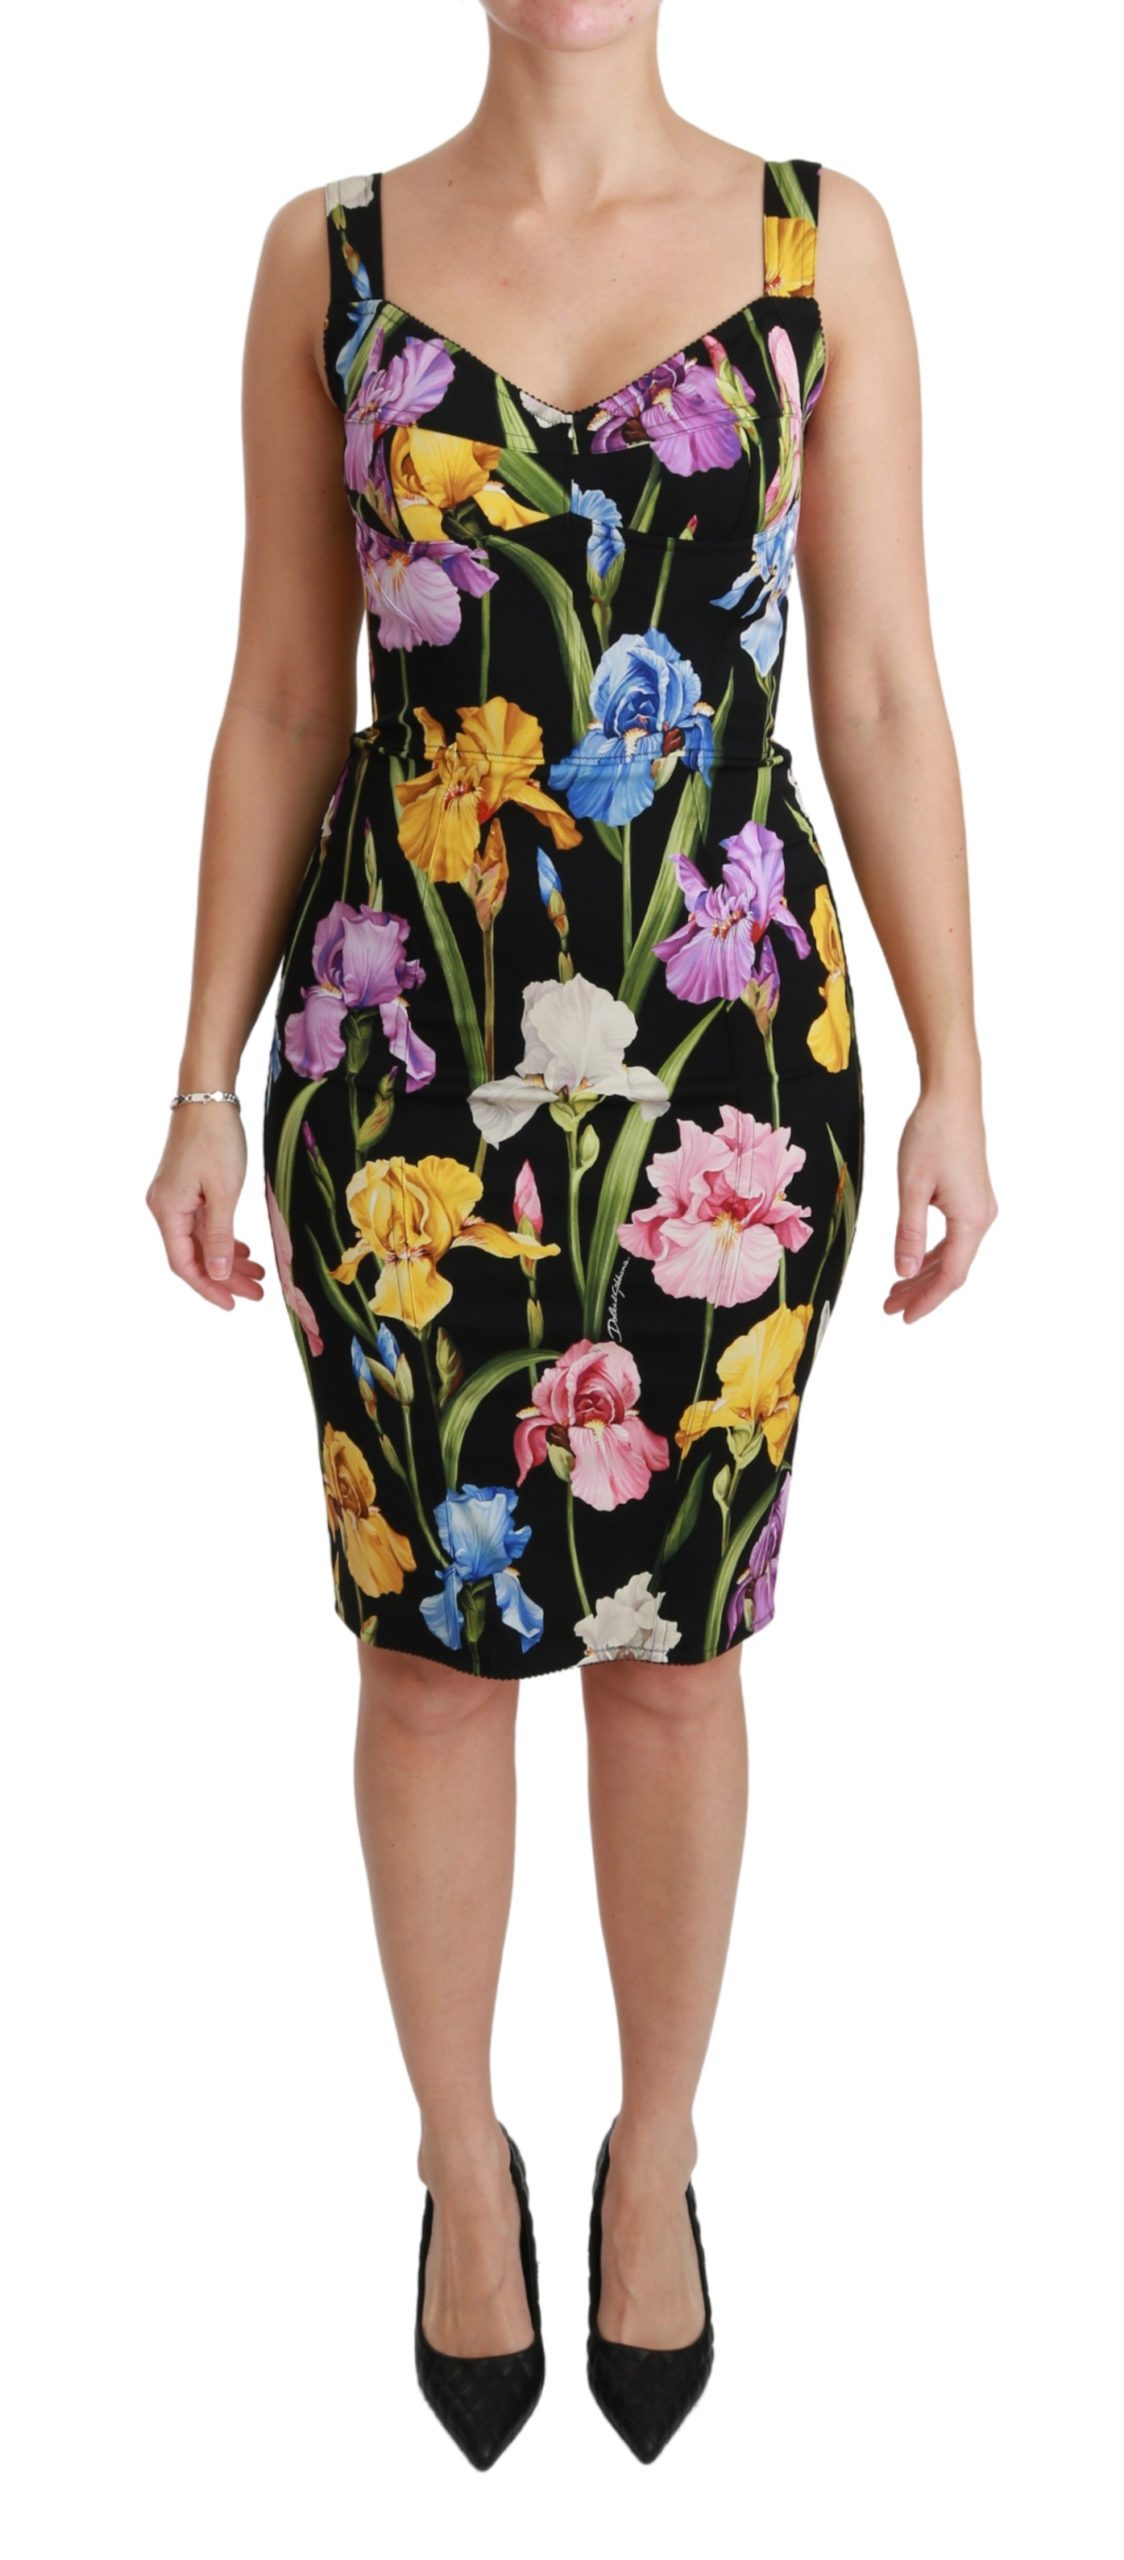 Dolce & Gabbana Women's Iris Print Silk Stretch Dress Black DR2452 - IT40|S